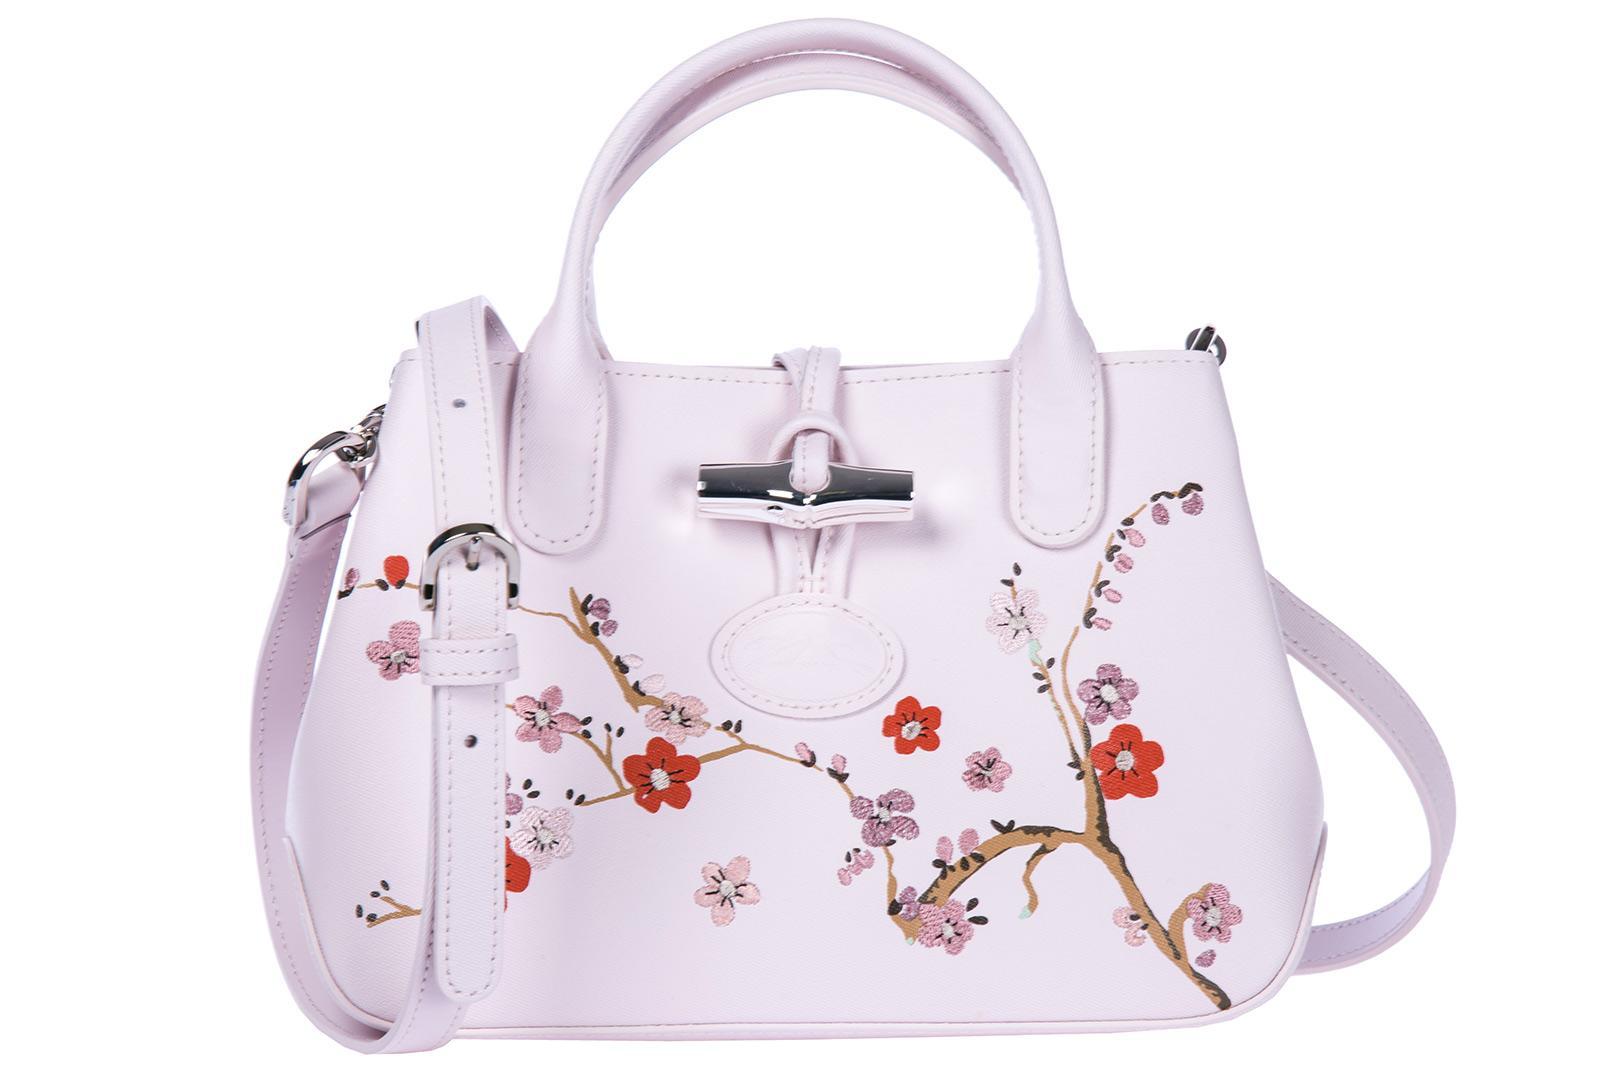 Longchamp Women's Leather Handbag Shopping Bag Purse In Pink